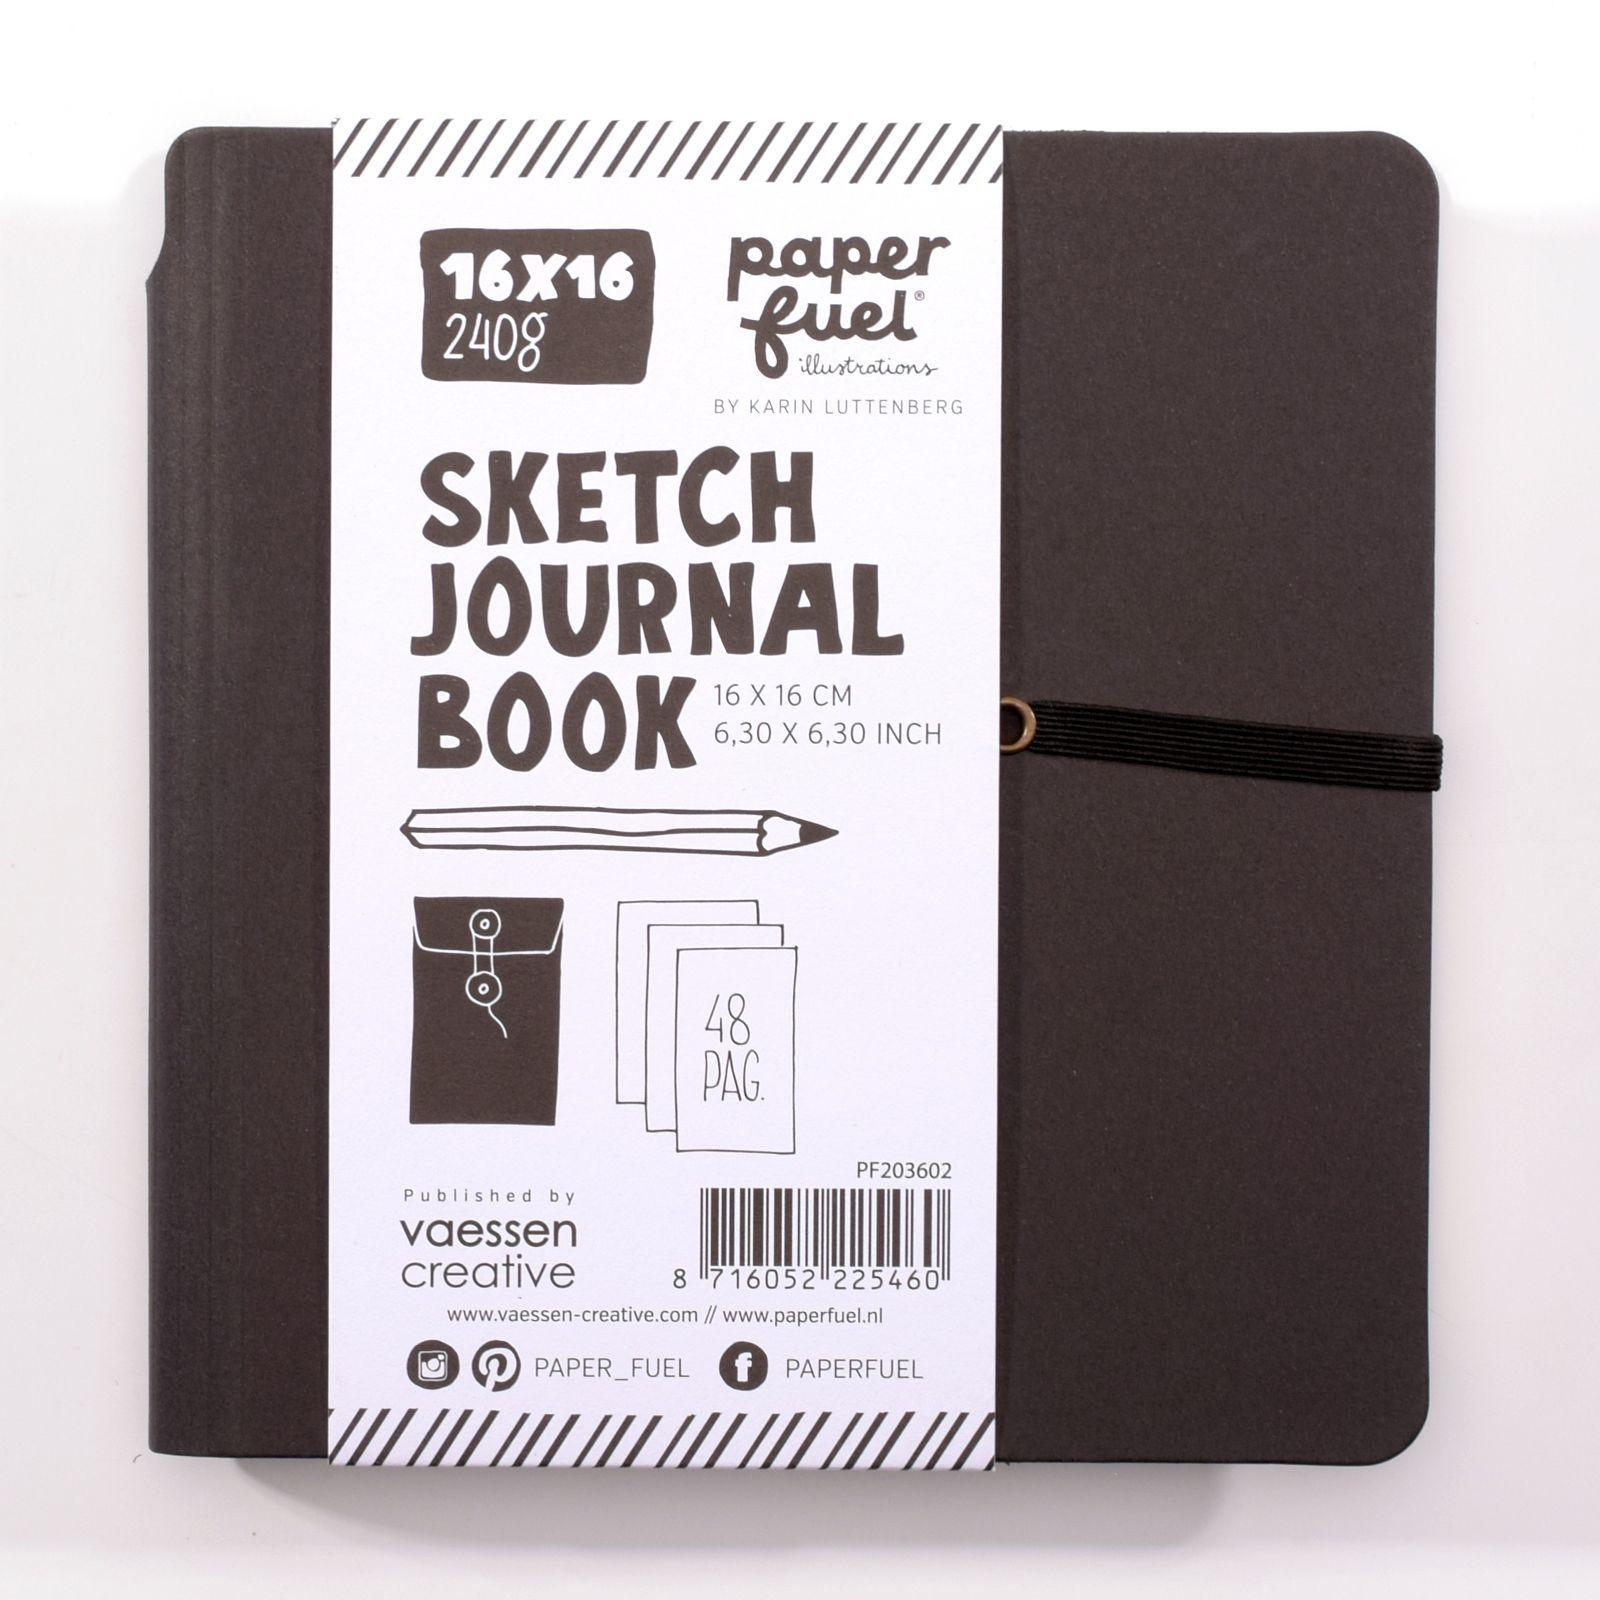 SKETCH JOURNAL BOOK 16X16 CM